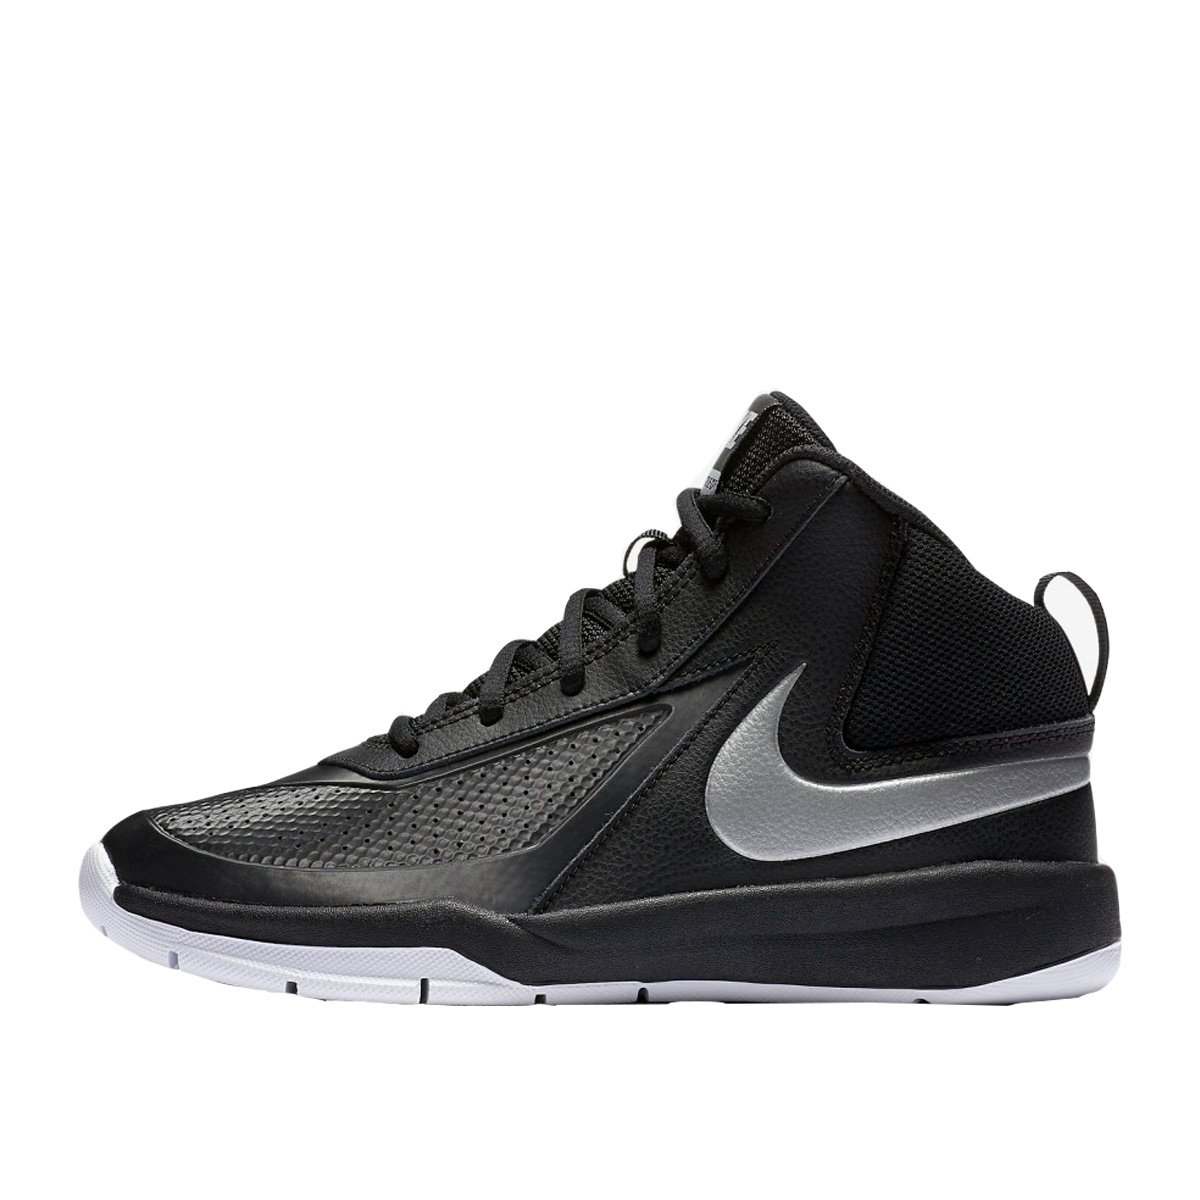 Bizz Store - Tênis Infantil Menino Nike Team Hustle D7 Basquete 2d7340b77f32e